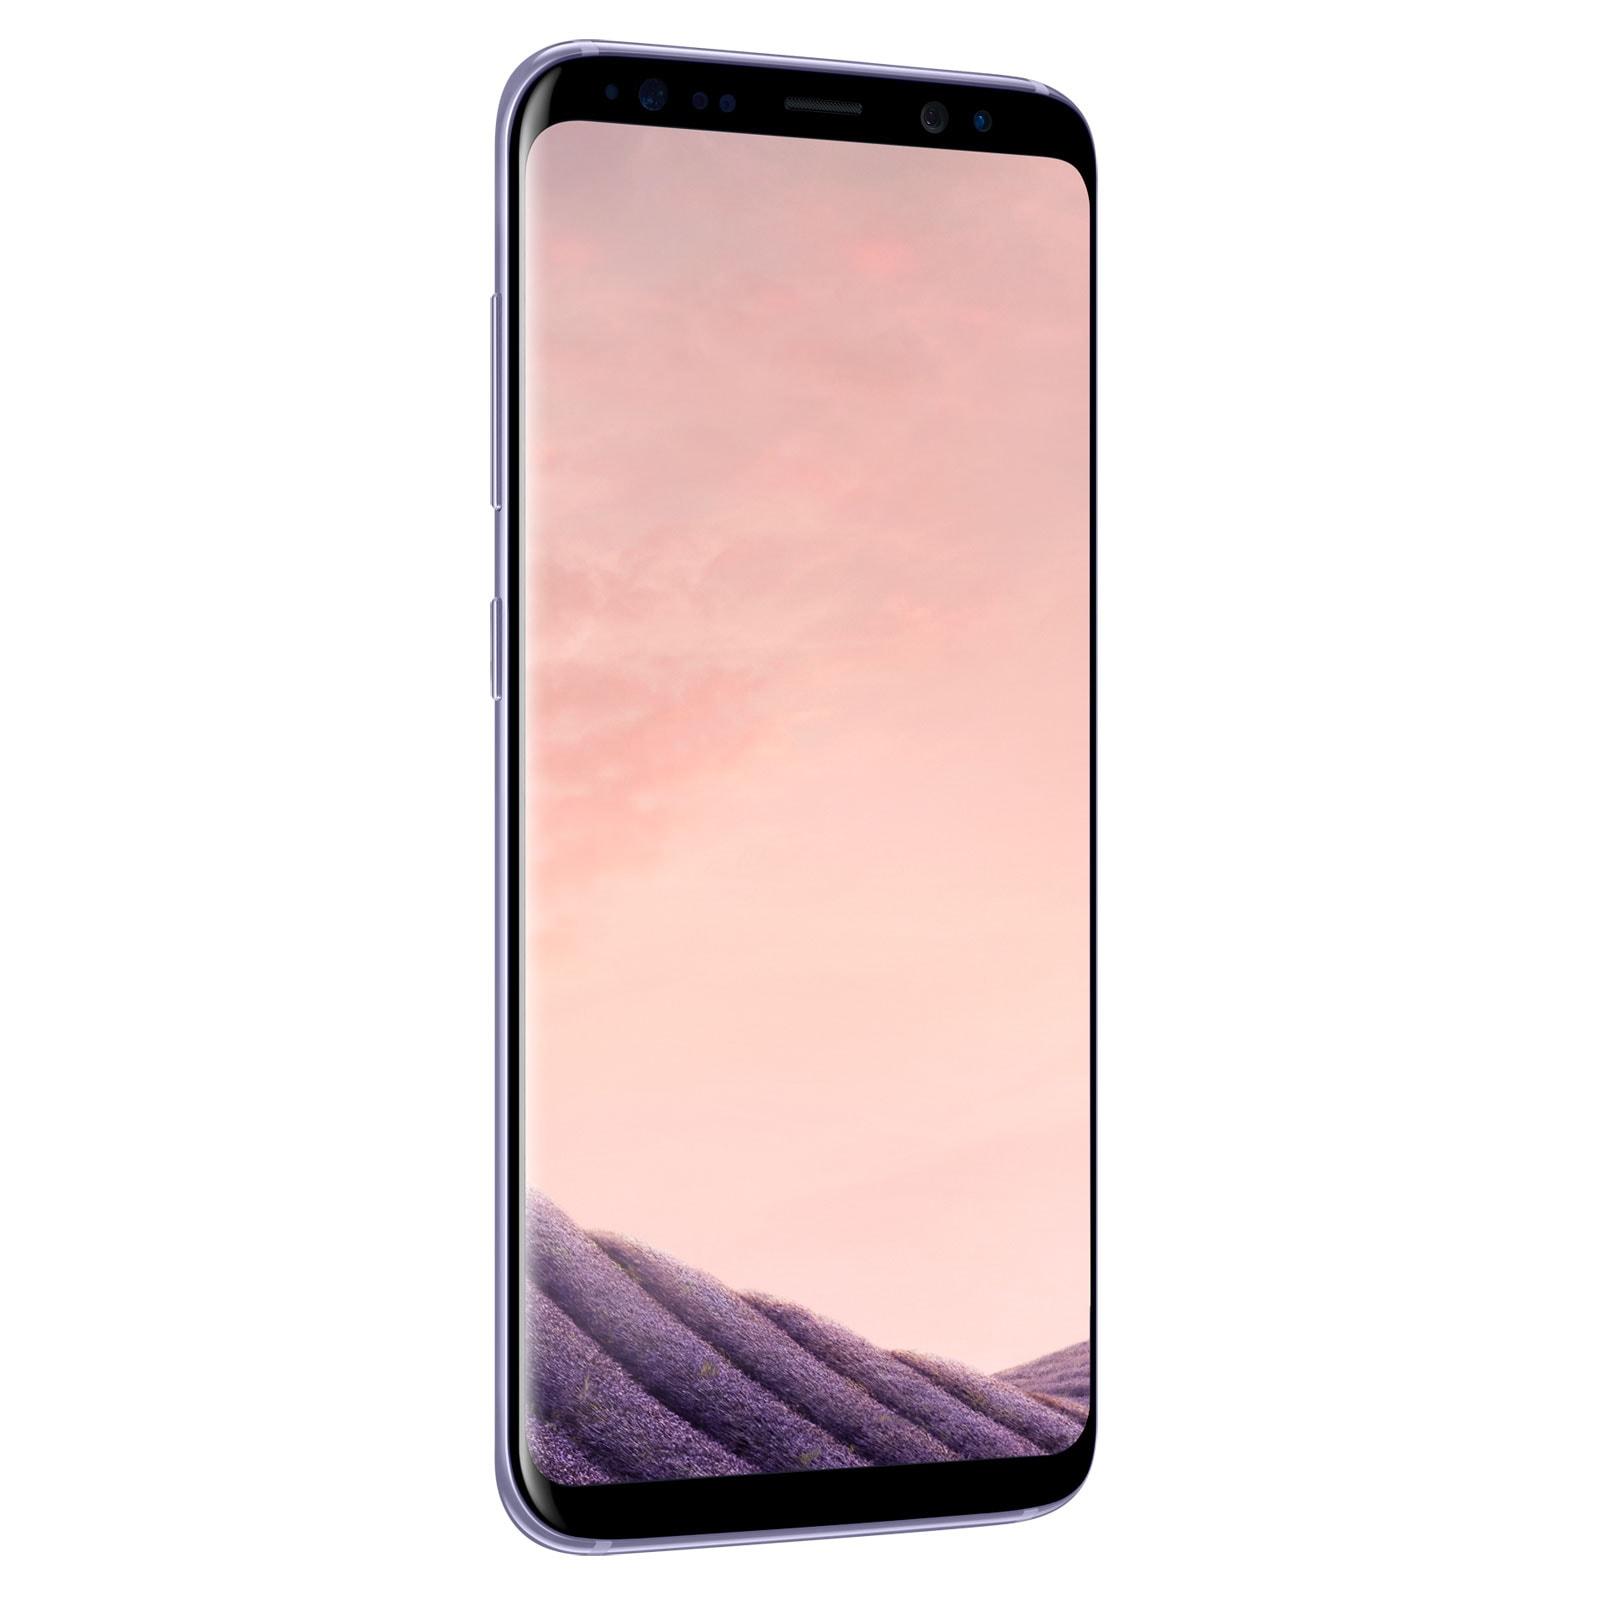 Samsung Galaxy S8 64Go G950 Orchid Gray - Téléphonie Samsung - 3